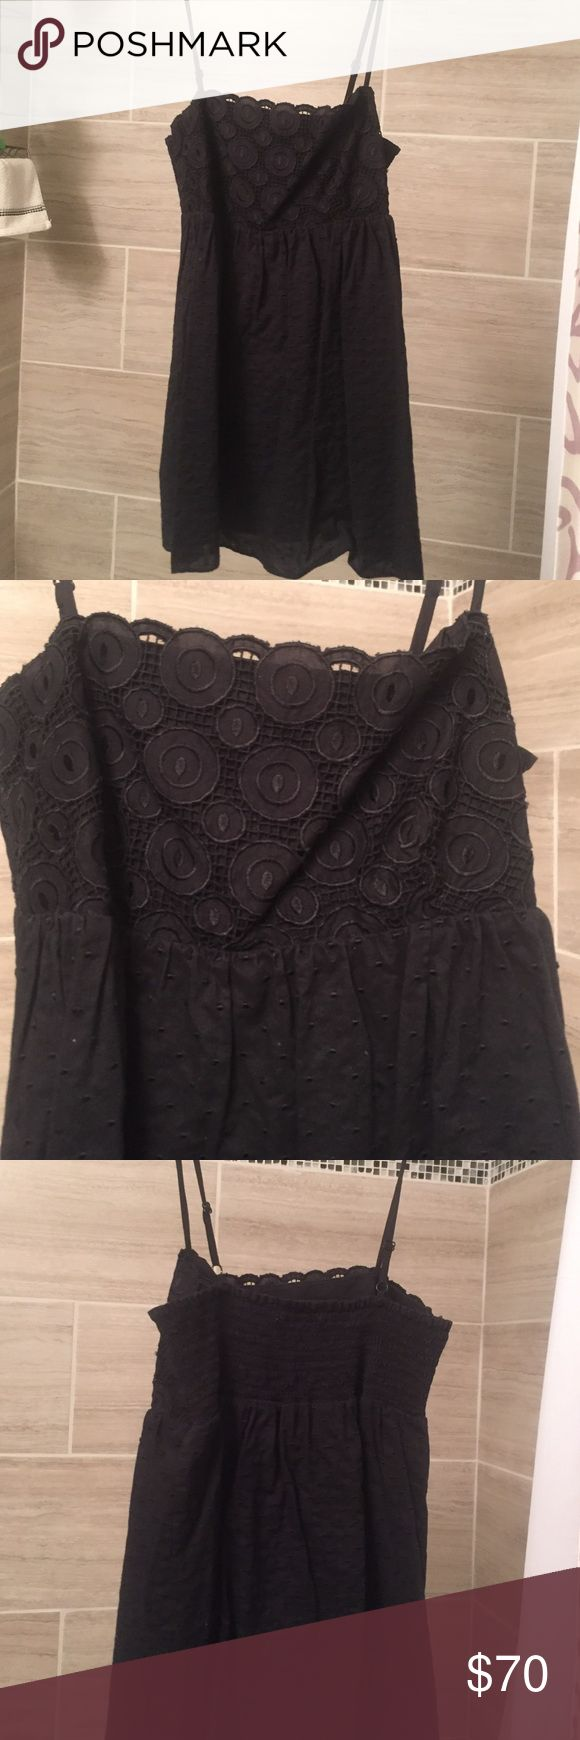 Laundry by Shelli Segal Black Babydoll Too Laundry by Shelli Segal Black Babydoll Too, size XS, great condition Laundry by Shelli Segal Tops